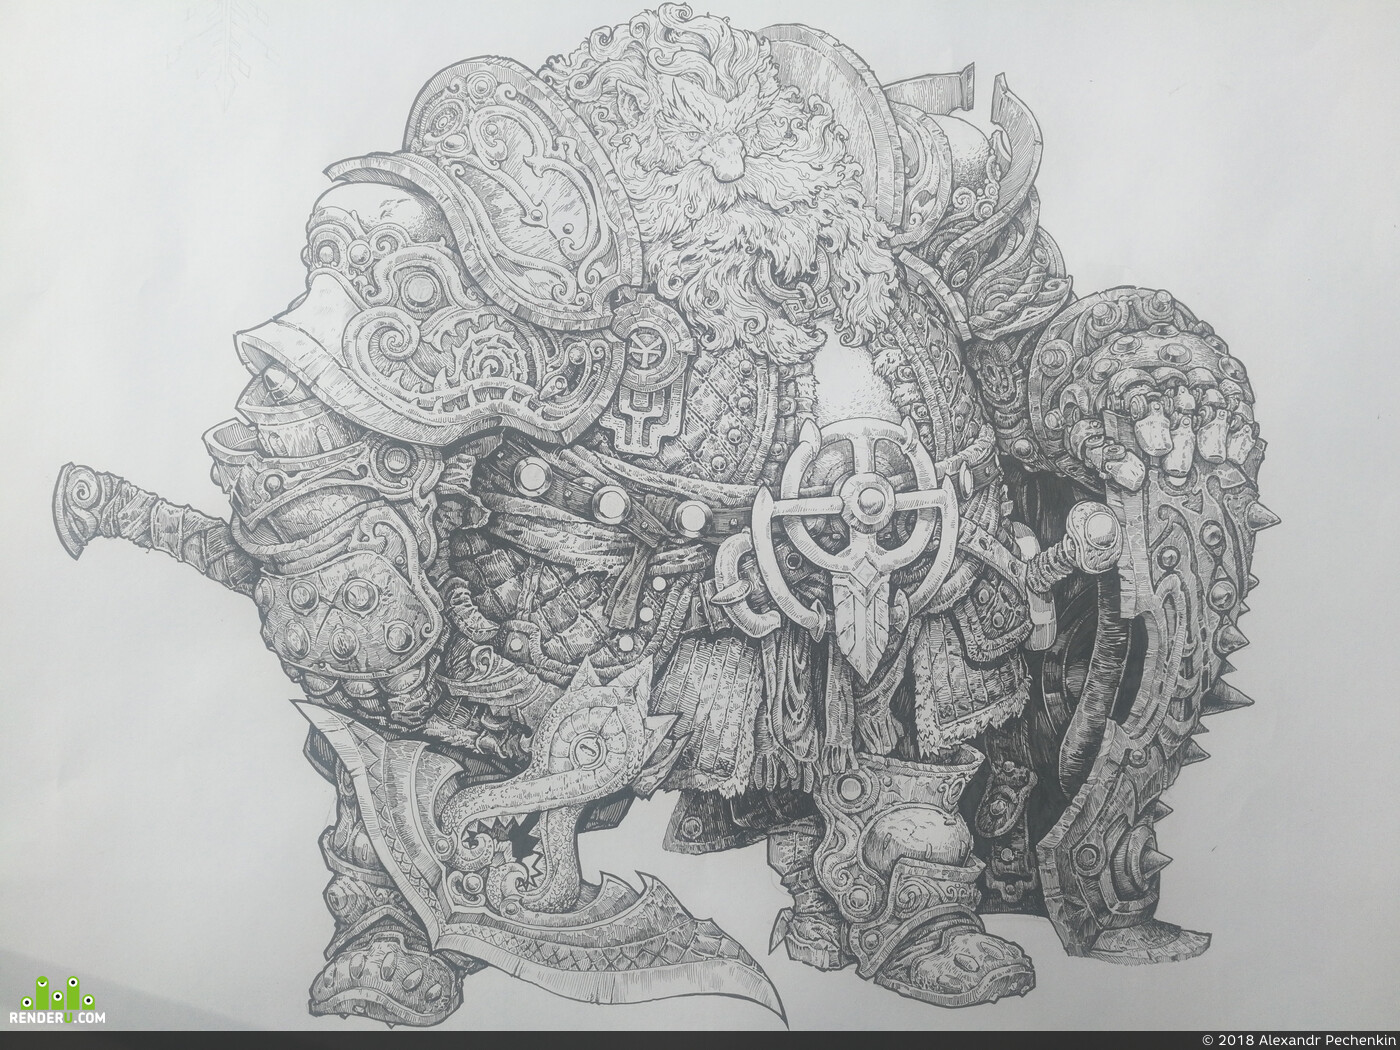 Littledruid, Картун (Cartoon), #ConceptartistRPG, concept-art, inktober